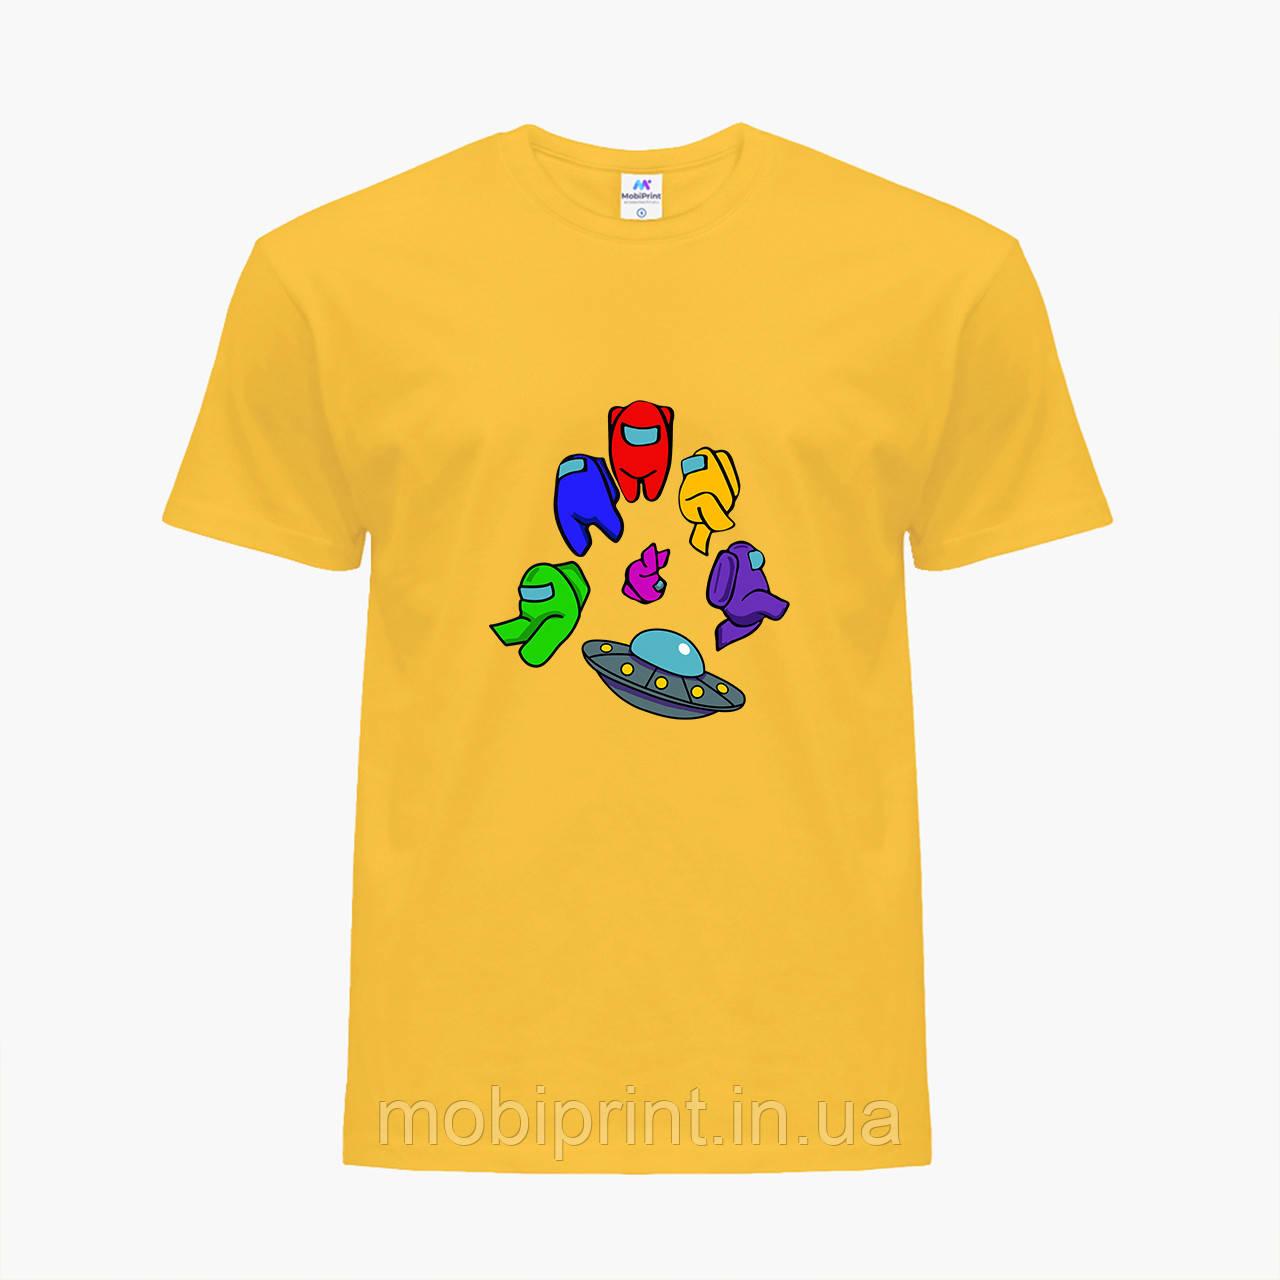 Дитяча футболка для хлопчиків Амонг Ас (Among Us) (25186-2585) Жовтий